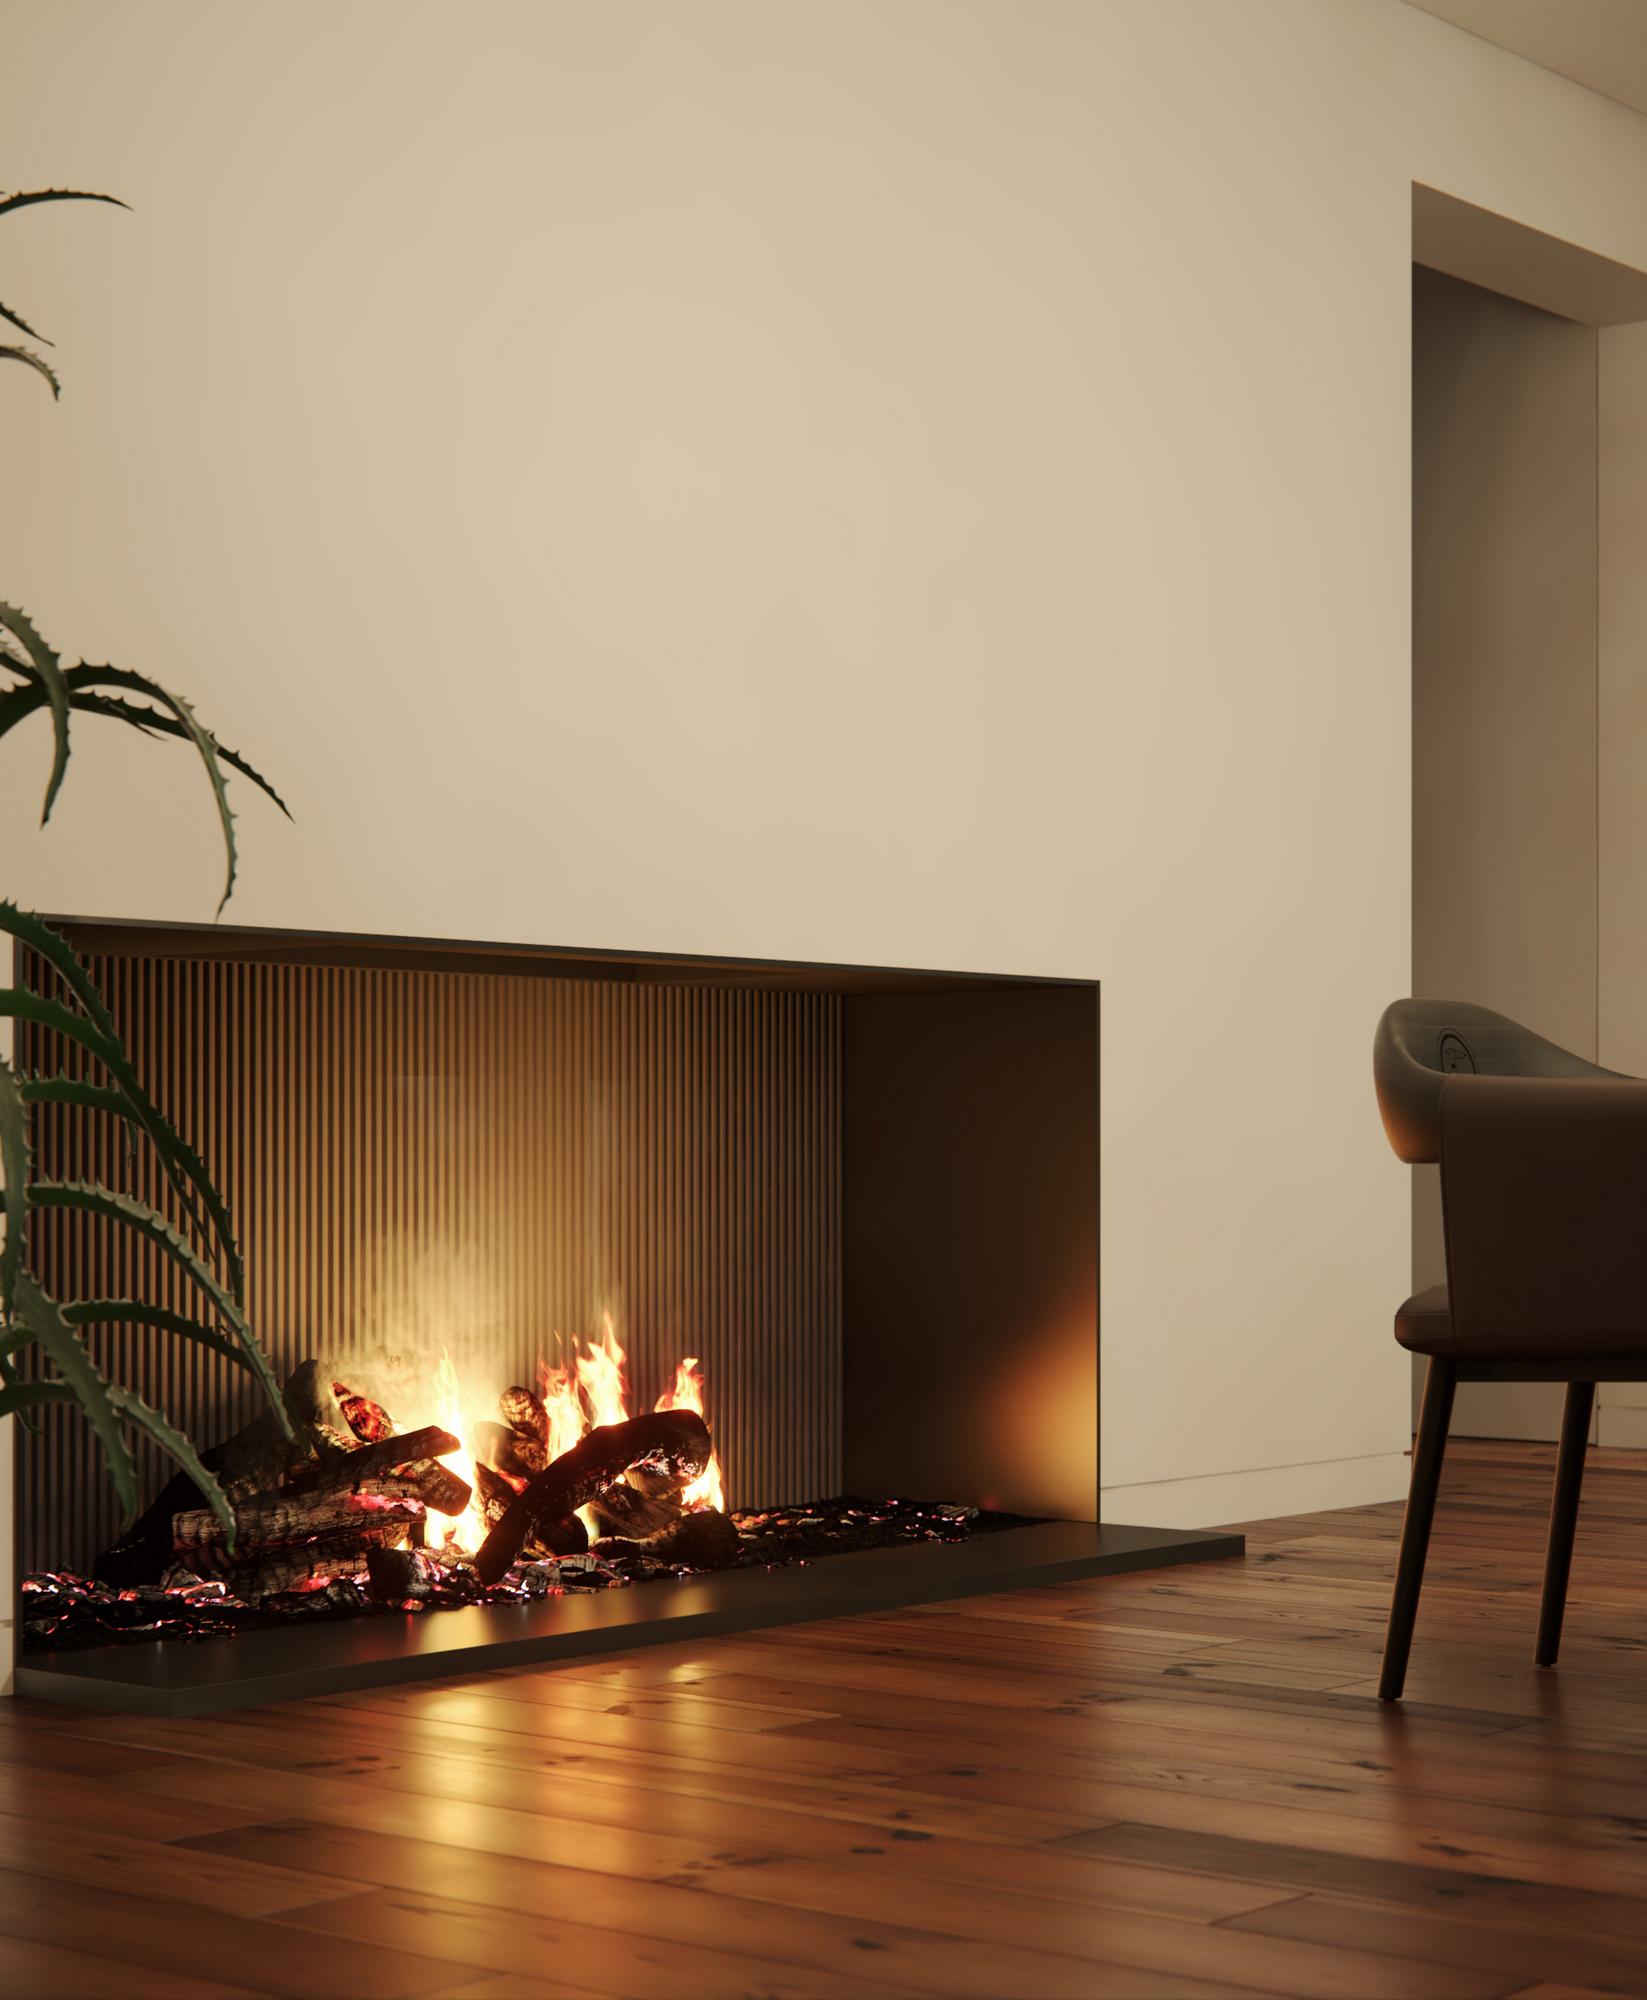 Casa Aroeira_Living Room_Dusk_Cam03.jpg